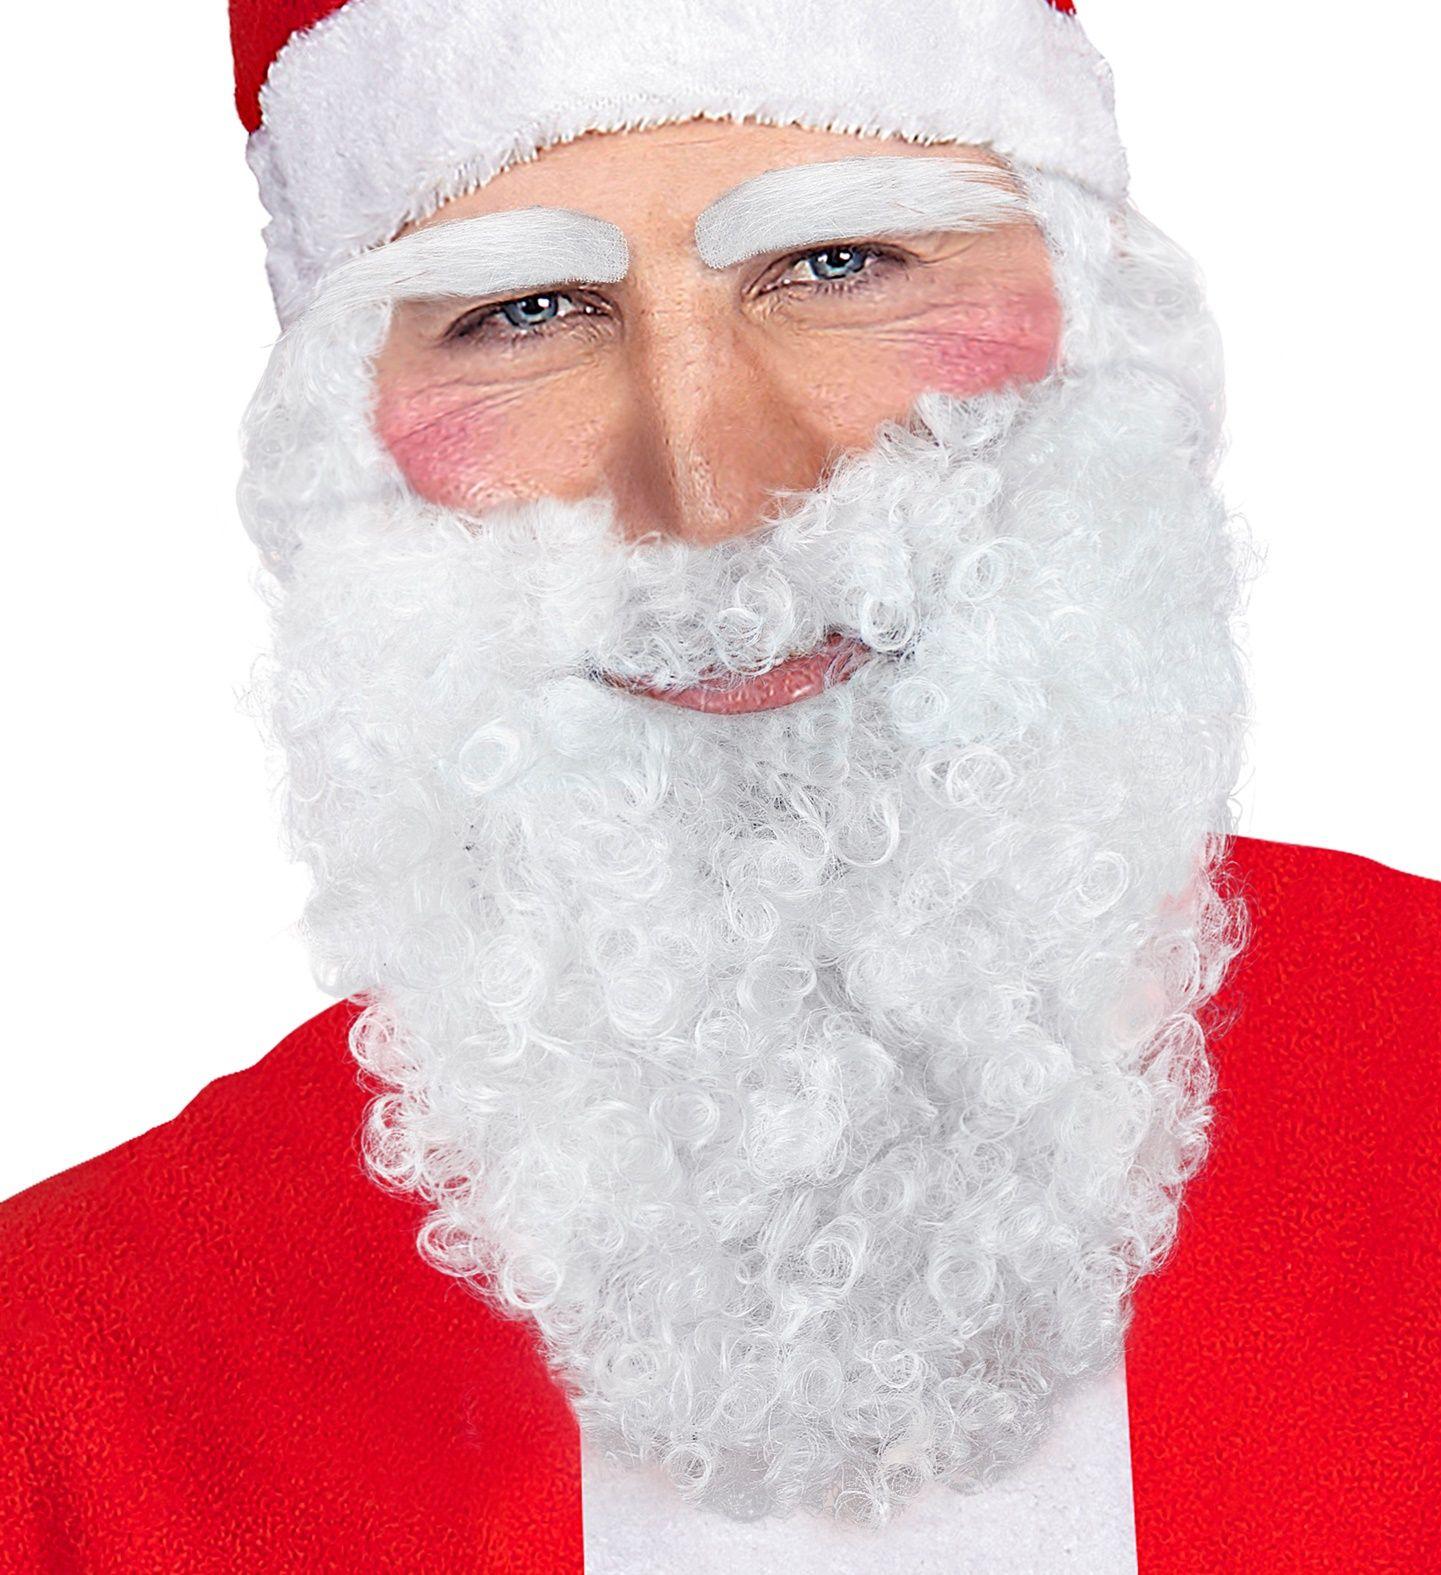 Witte kerstman baard, snor en wenkbrauwen